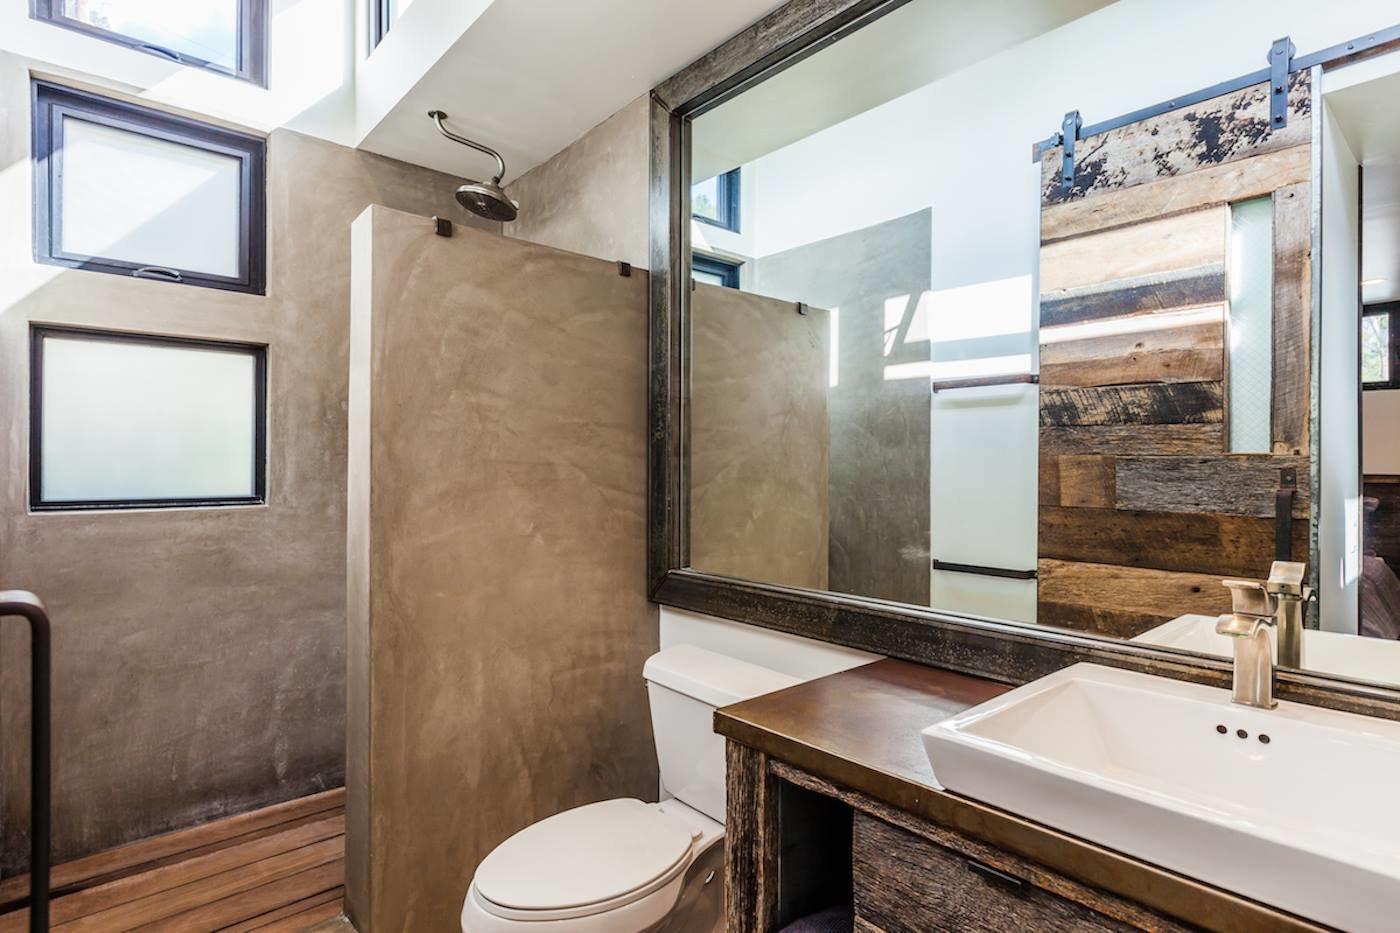 Bath Room, Ceiling Lighting, Metal Counter, Open Shower, Light Hardwood Floor, and Concrete Wall Gorgeous Master Bath  Reclaimed Malibu Modern Beach Retreat